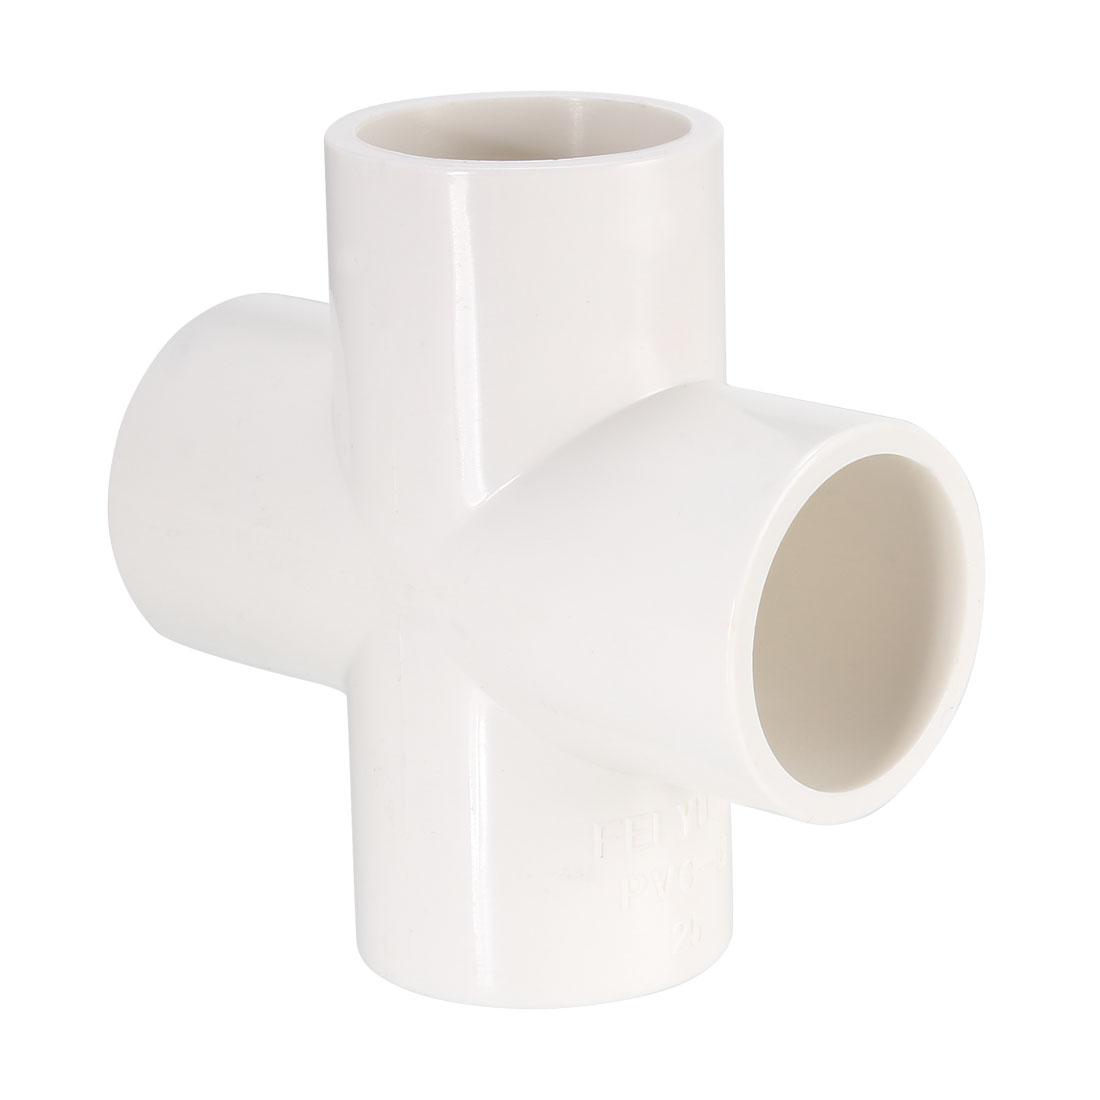 PVC Pipe Fitting, 4 Way Cross, 25mm Socket, PVC Furniture Fittings White 2Pcs